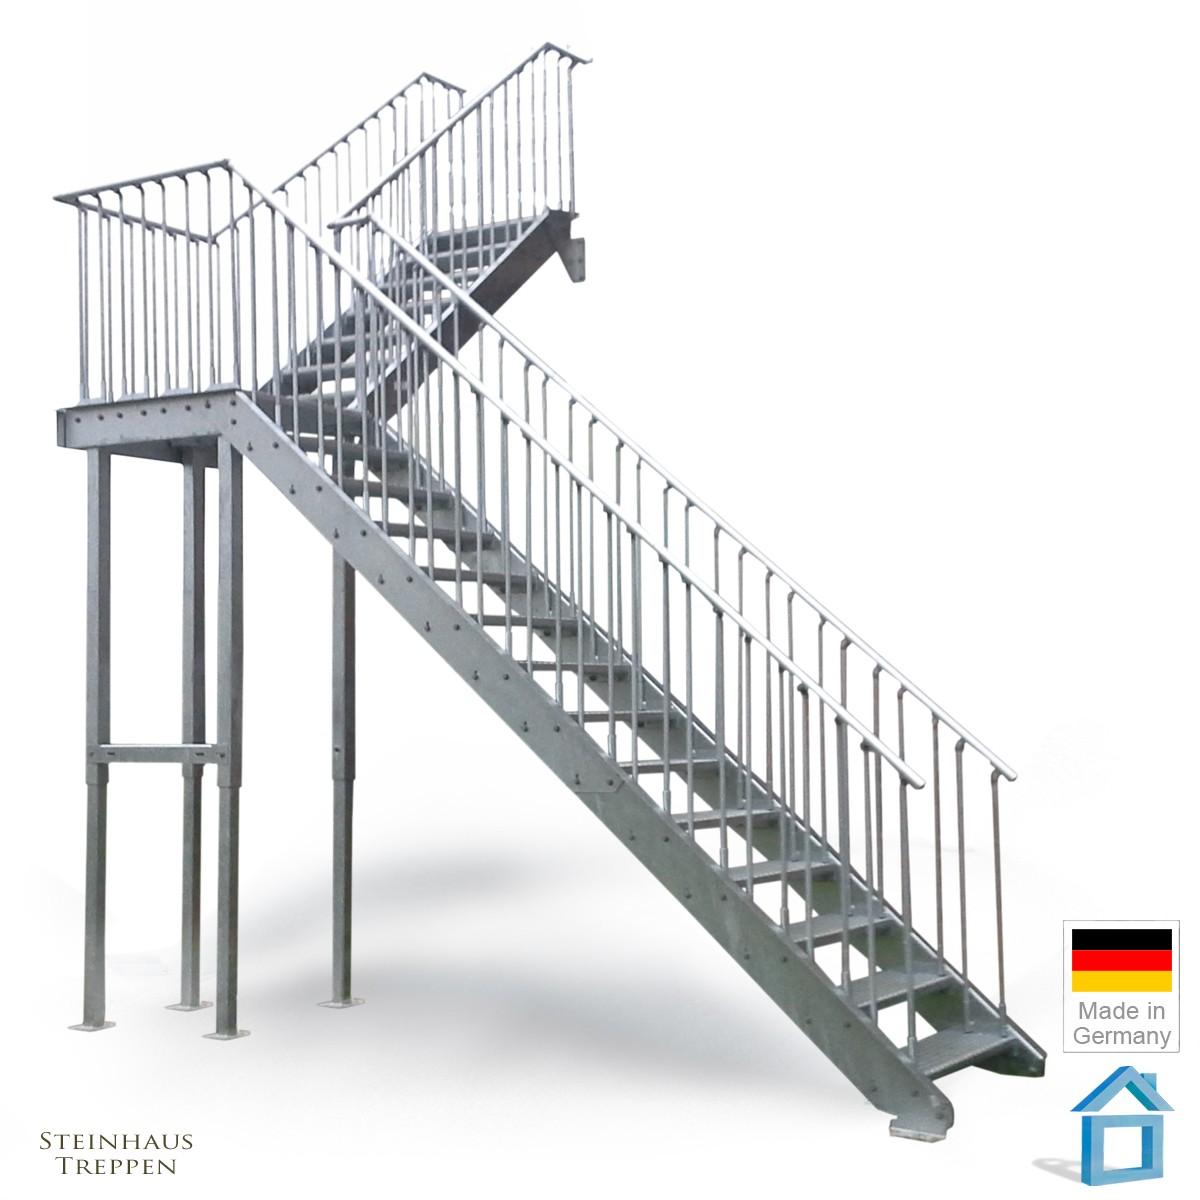 Auentreppe Verzinkt Perfect Auentreppe Mit Balkon Auentreppe With